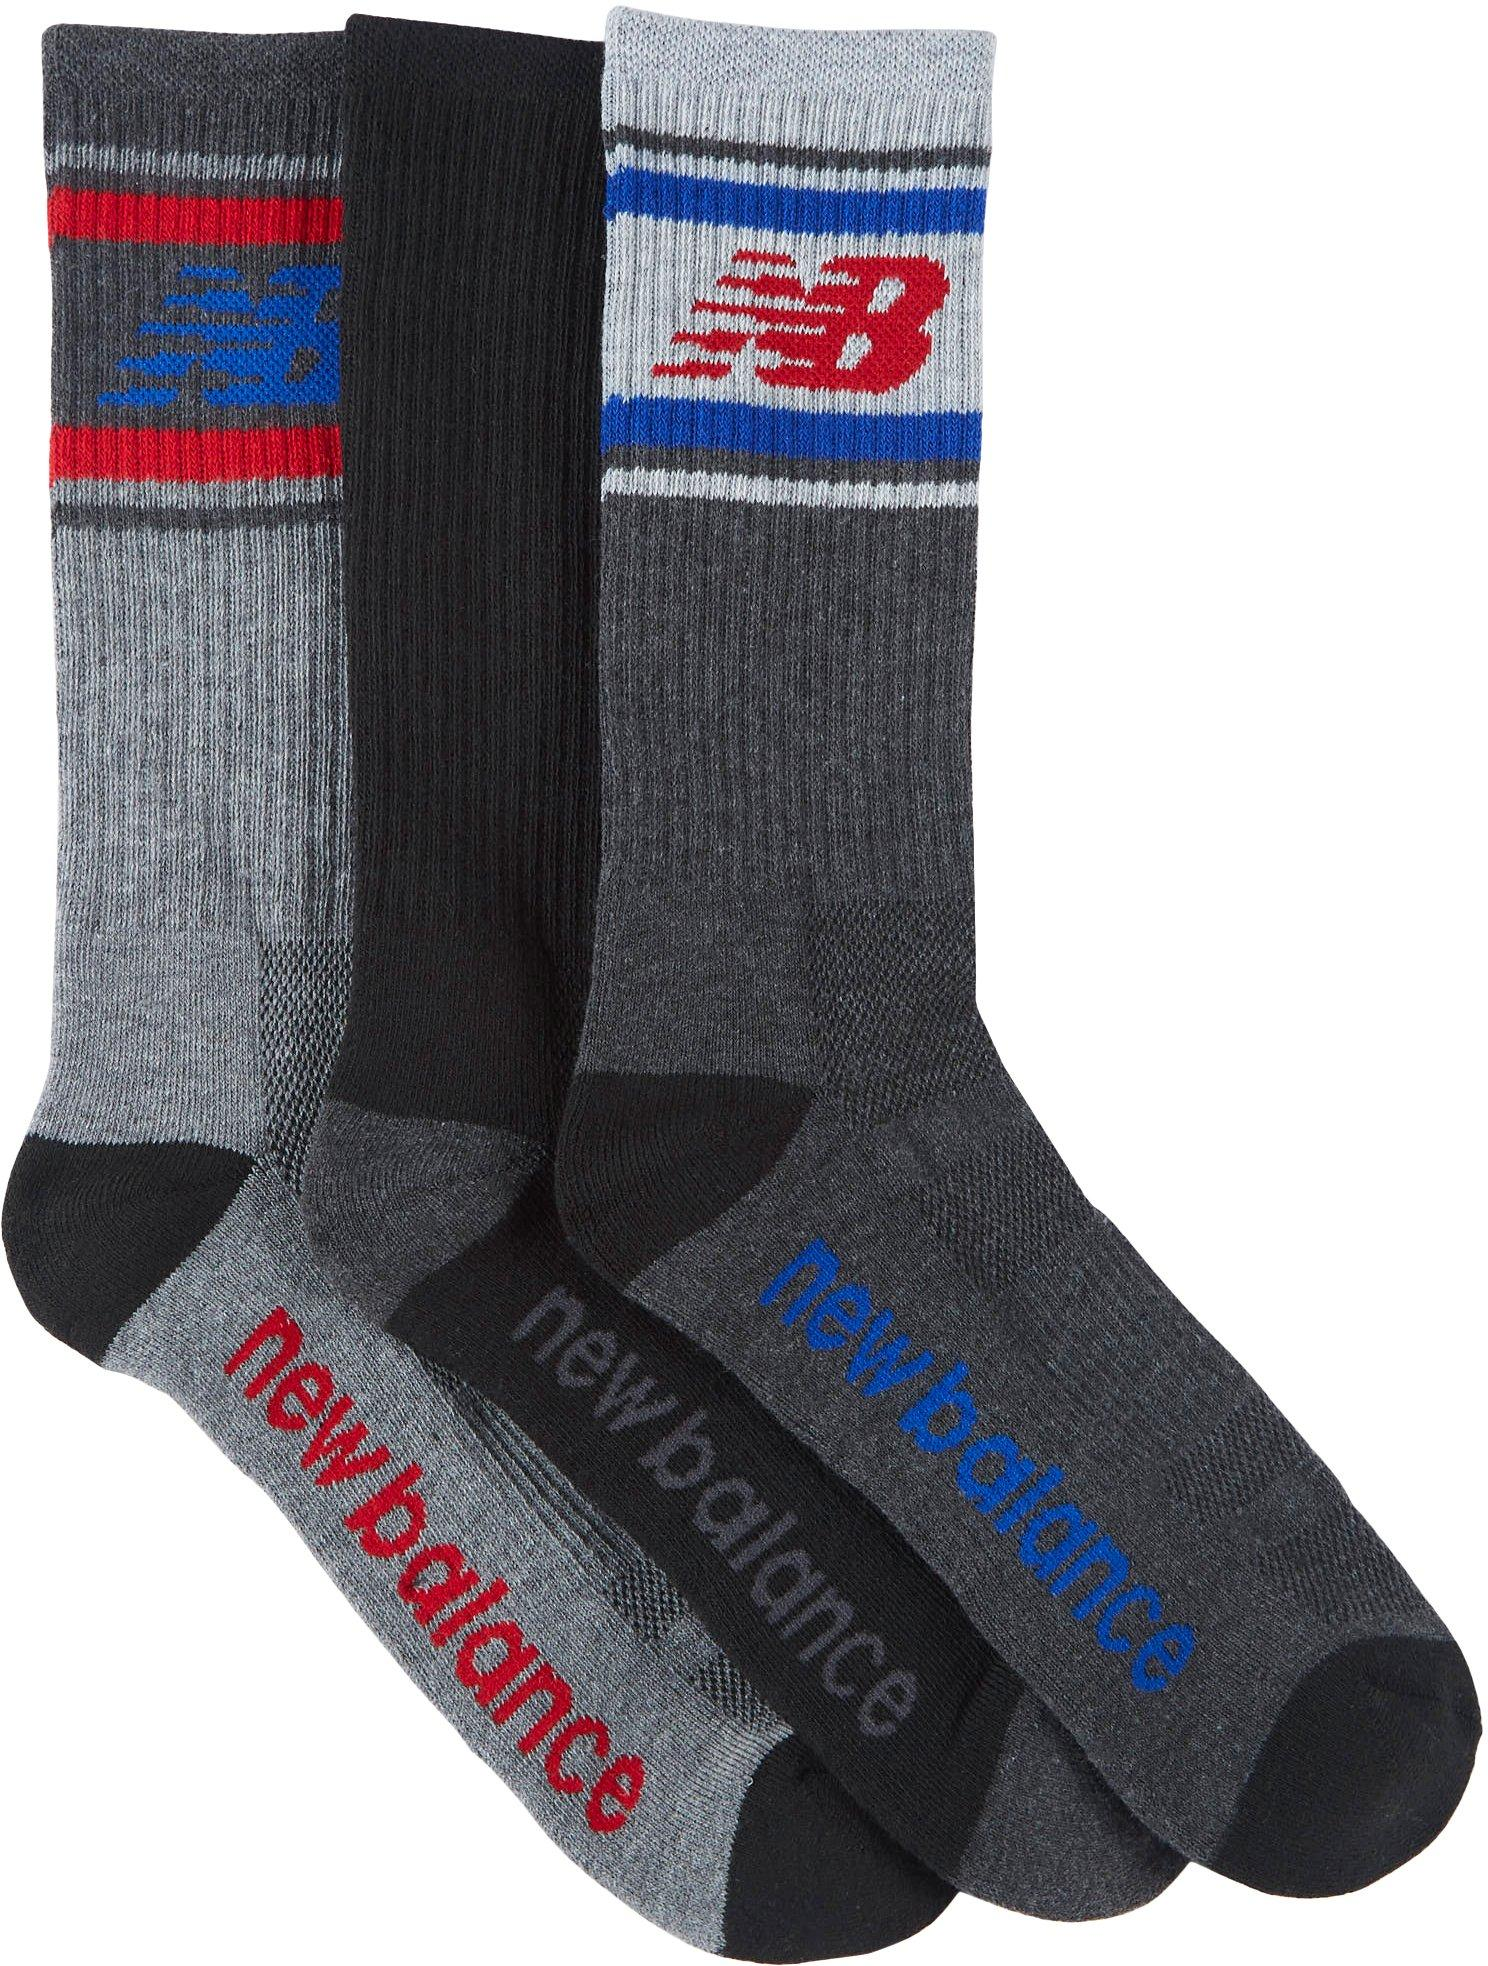 New Balance Mens 3-pk Performance Cushioned Crew Socks